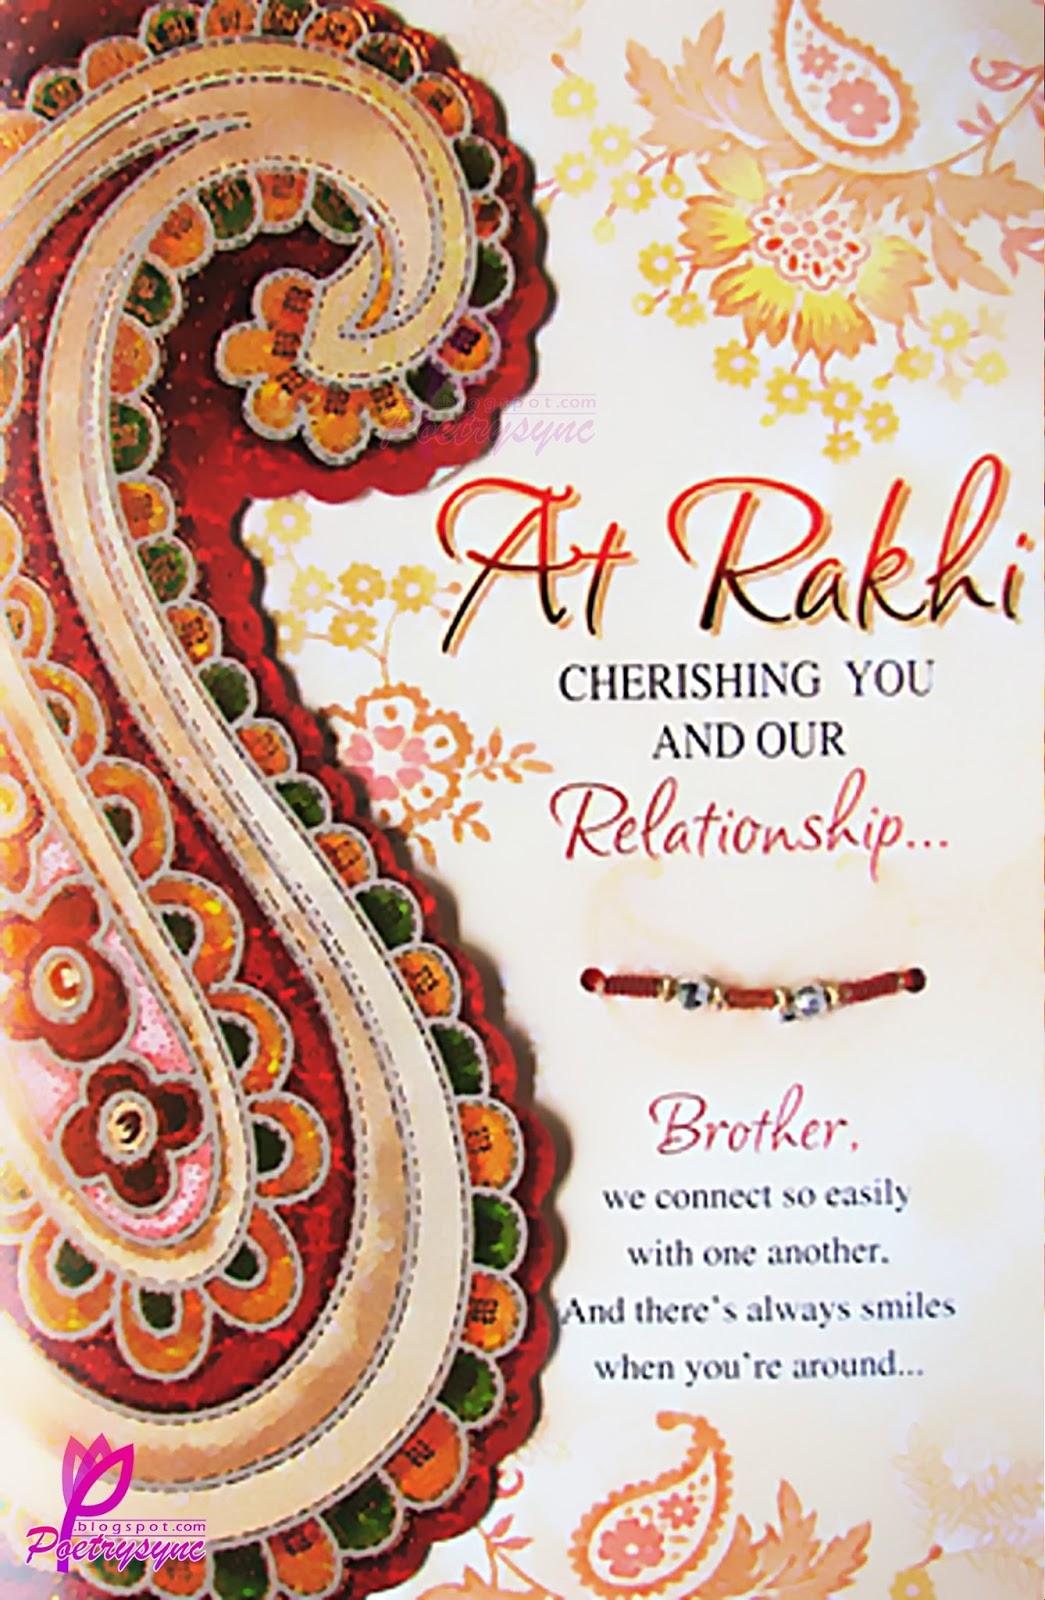 Rakhi Festival Quotes Brother: {2018}* Raksha Bandhan Greetings Card Images Pictures